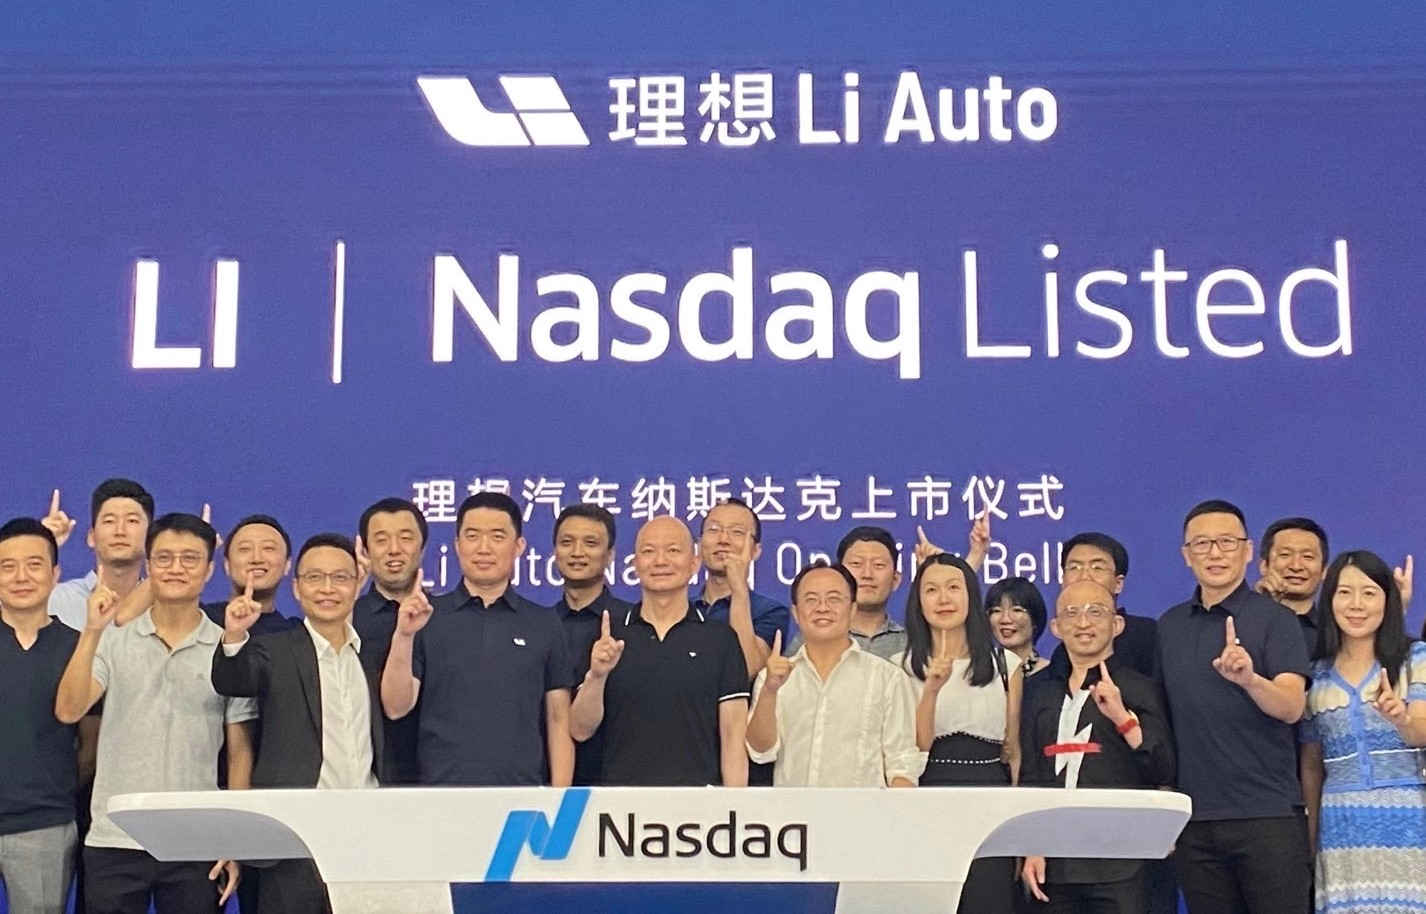 Li Auto Soars 39% Upon Debut in Upsized $1.1 Billion IPO